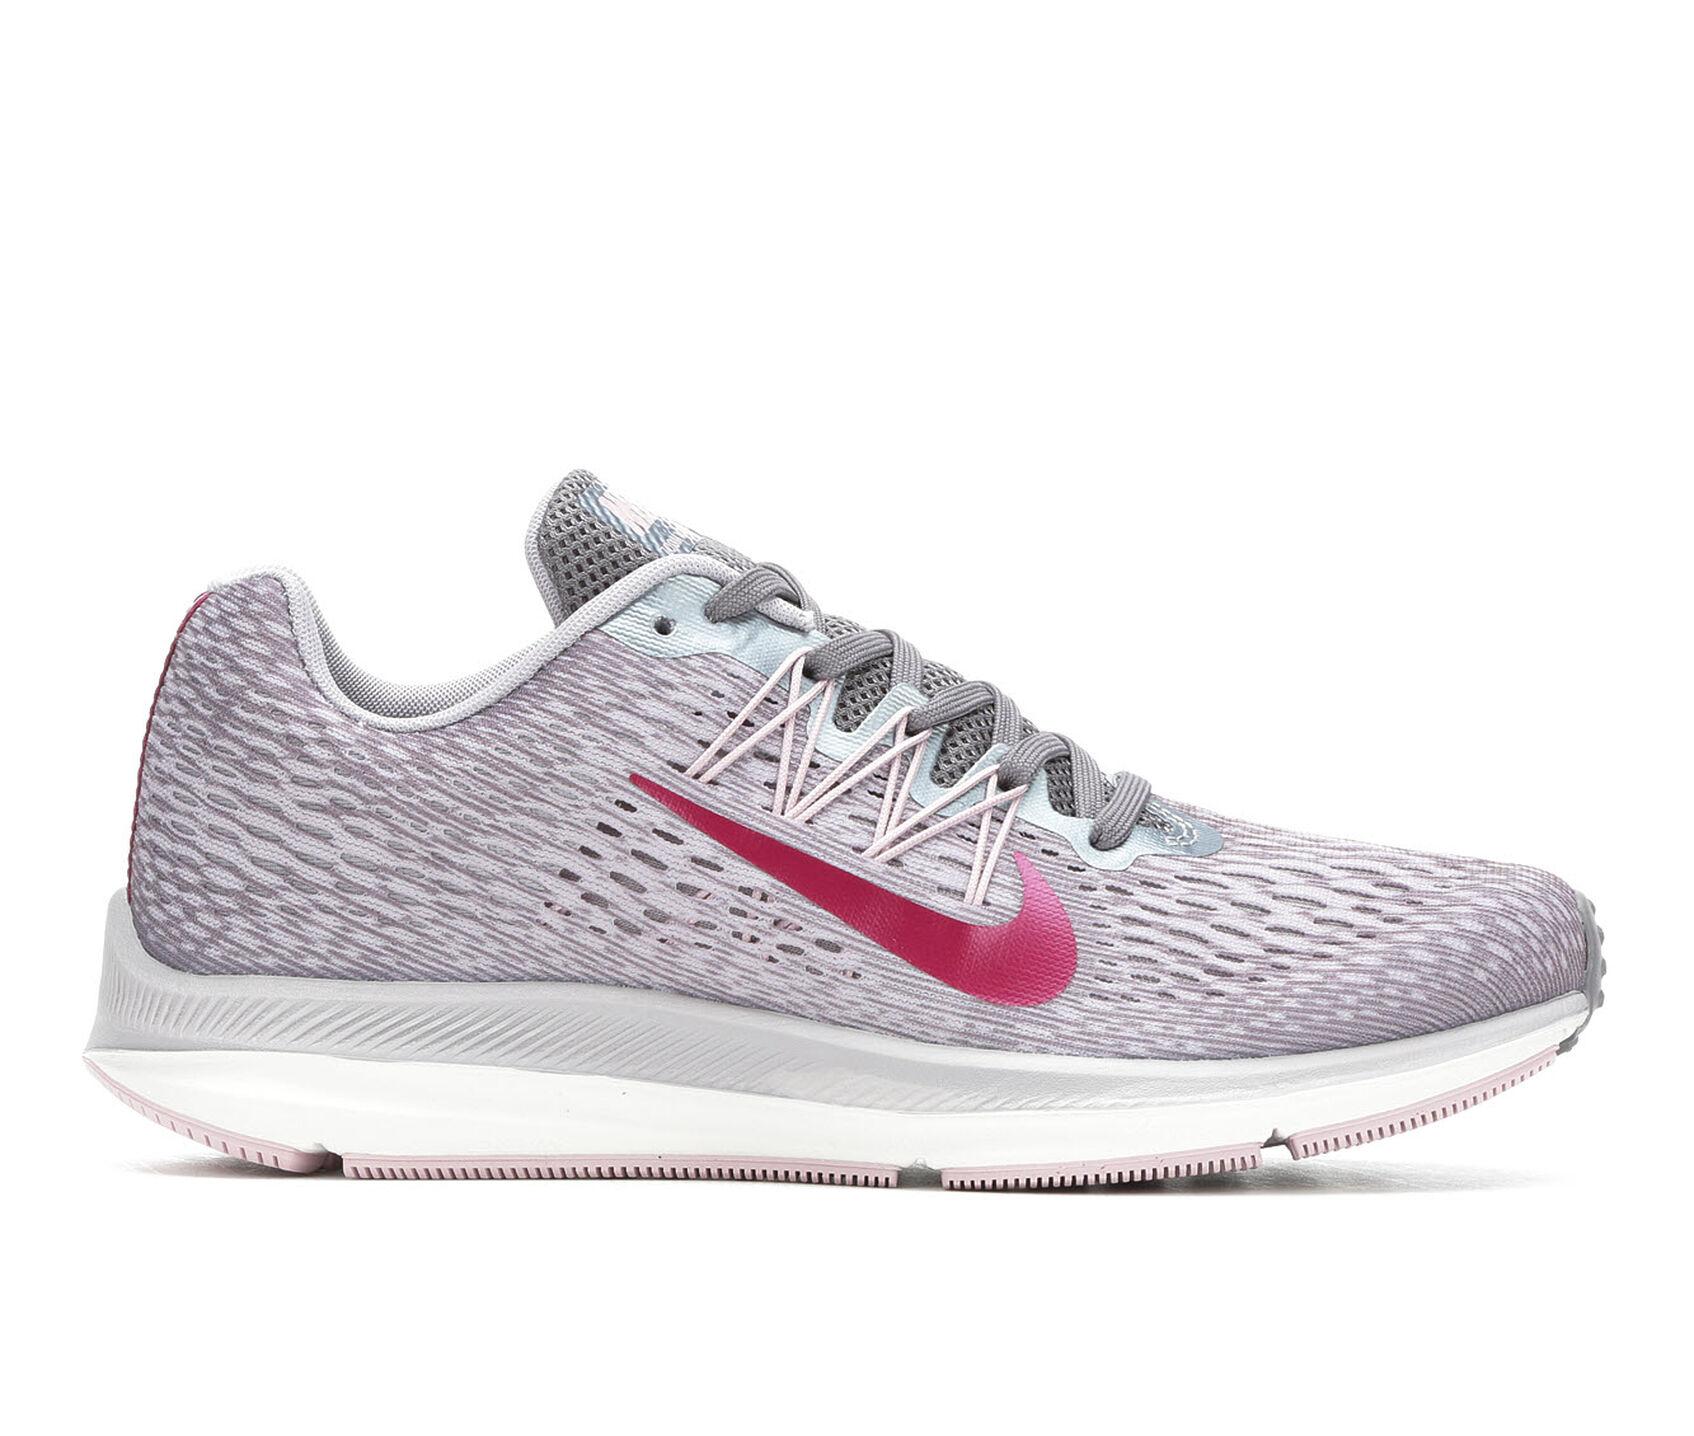 huge discount 29303 c8d9a Women's Nike Zoom Winflo 5 Running Shoes